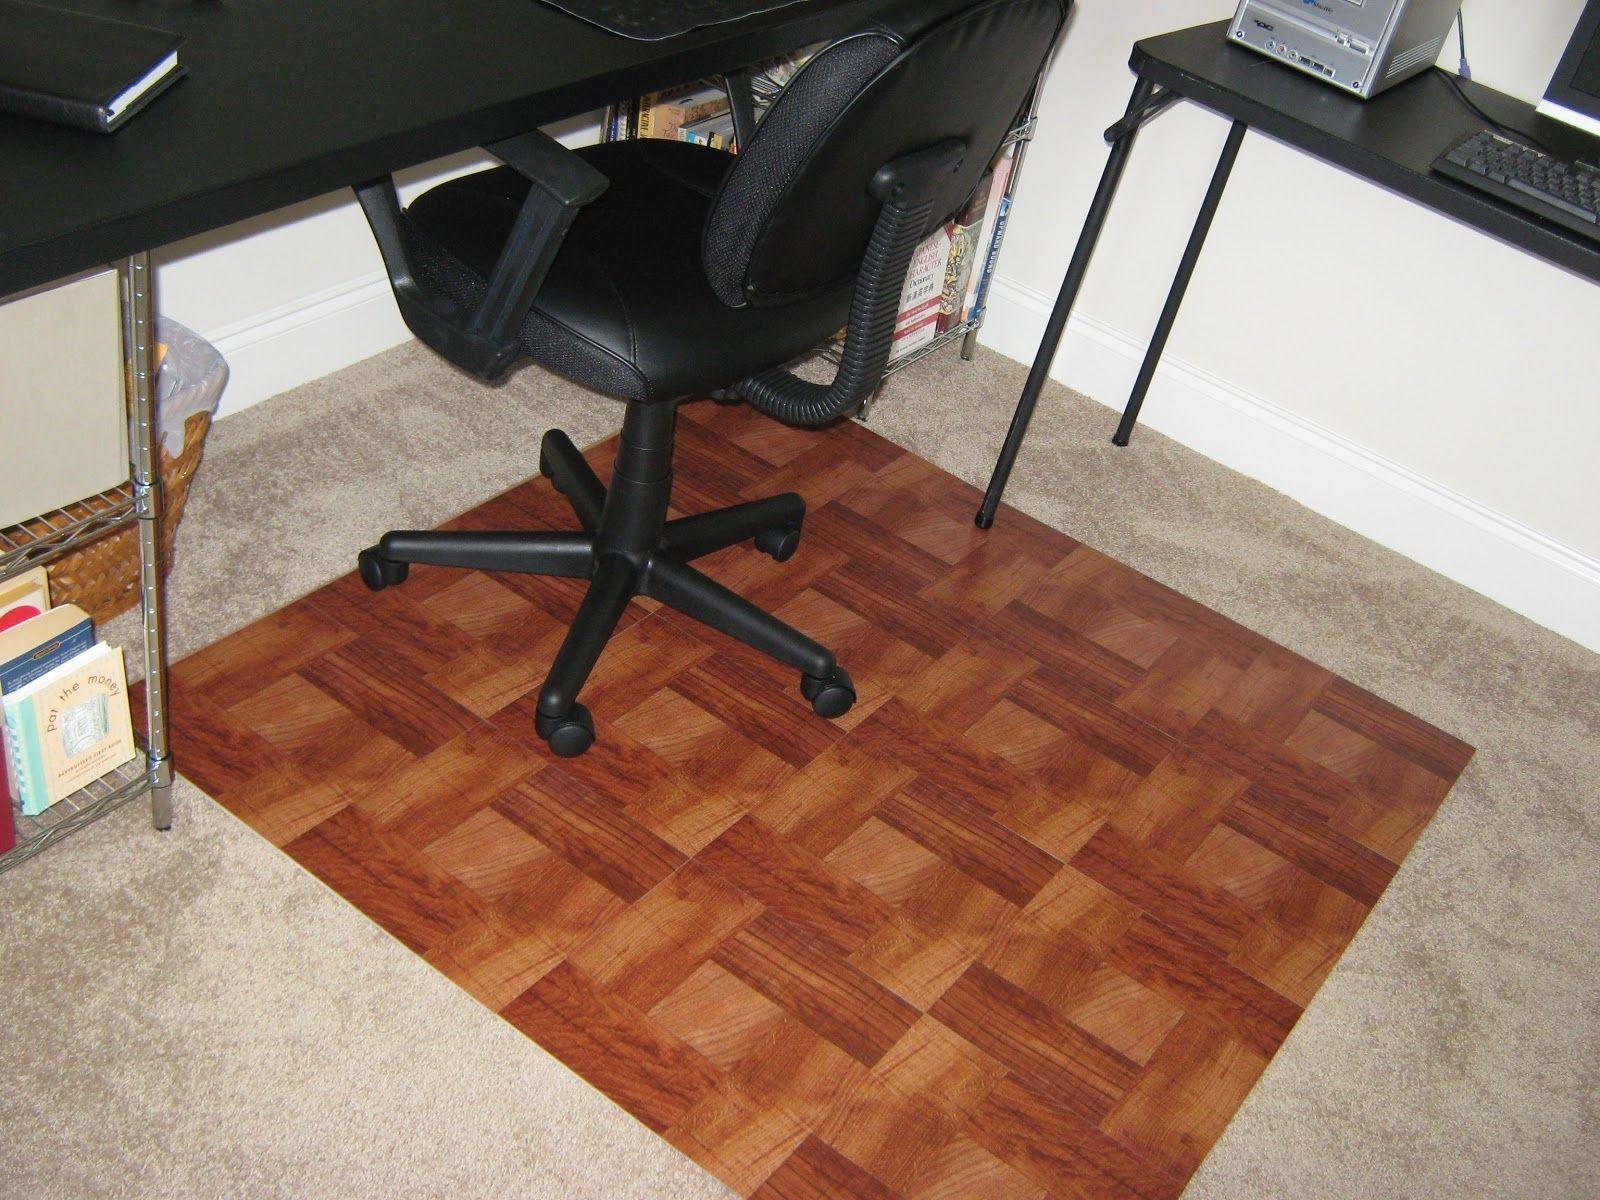 swid u pin from ku protect flooring how wood hana floors pinterest hardwood furniture floor care to